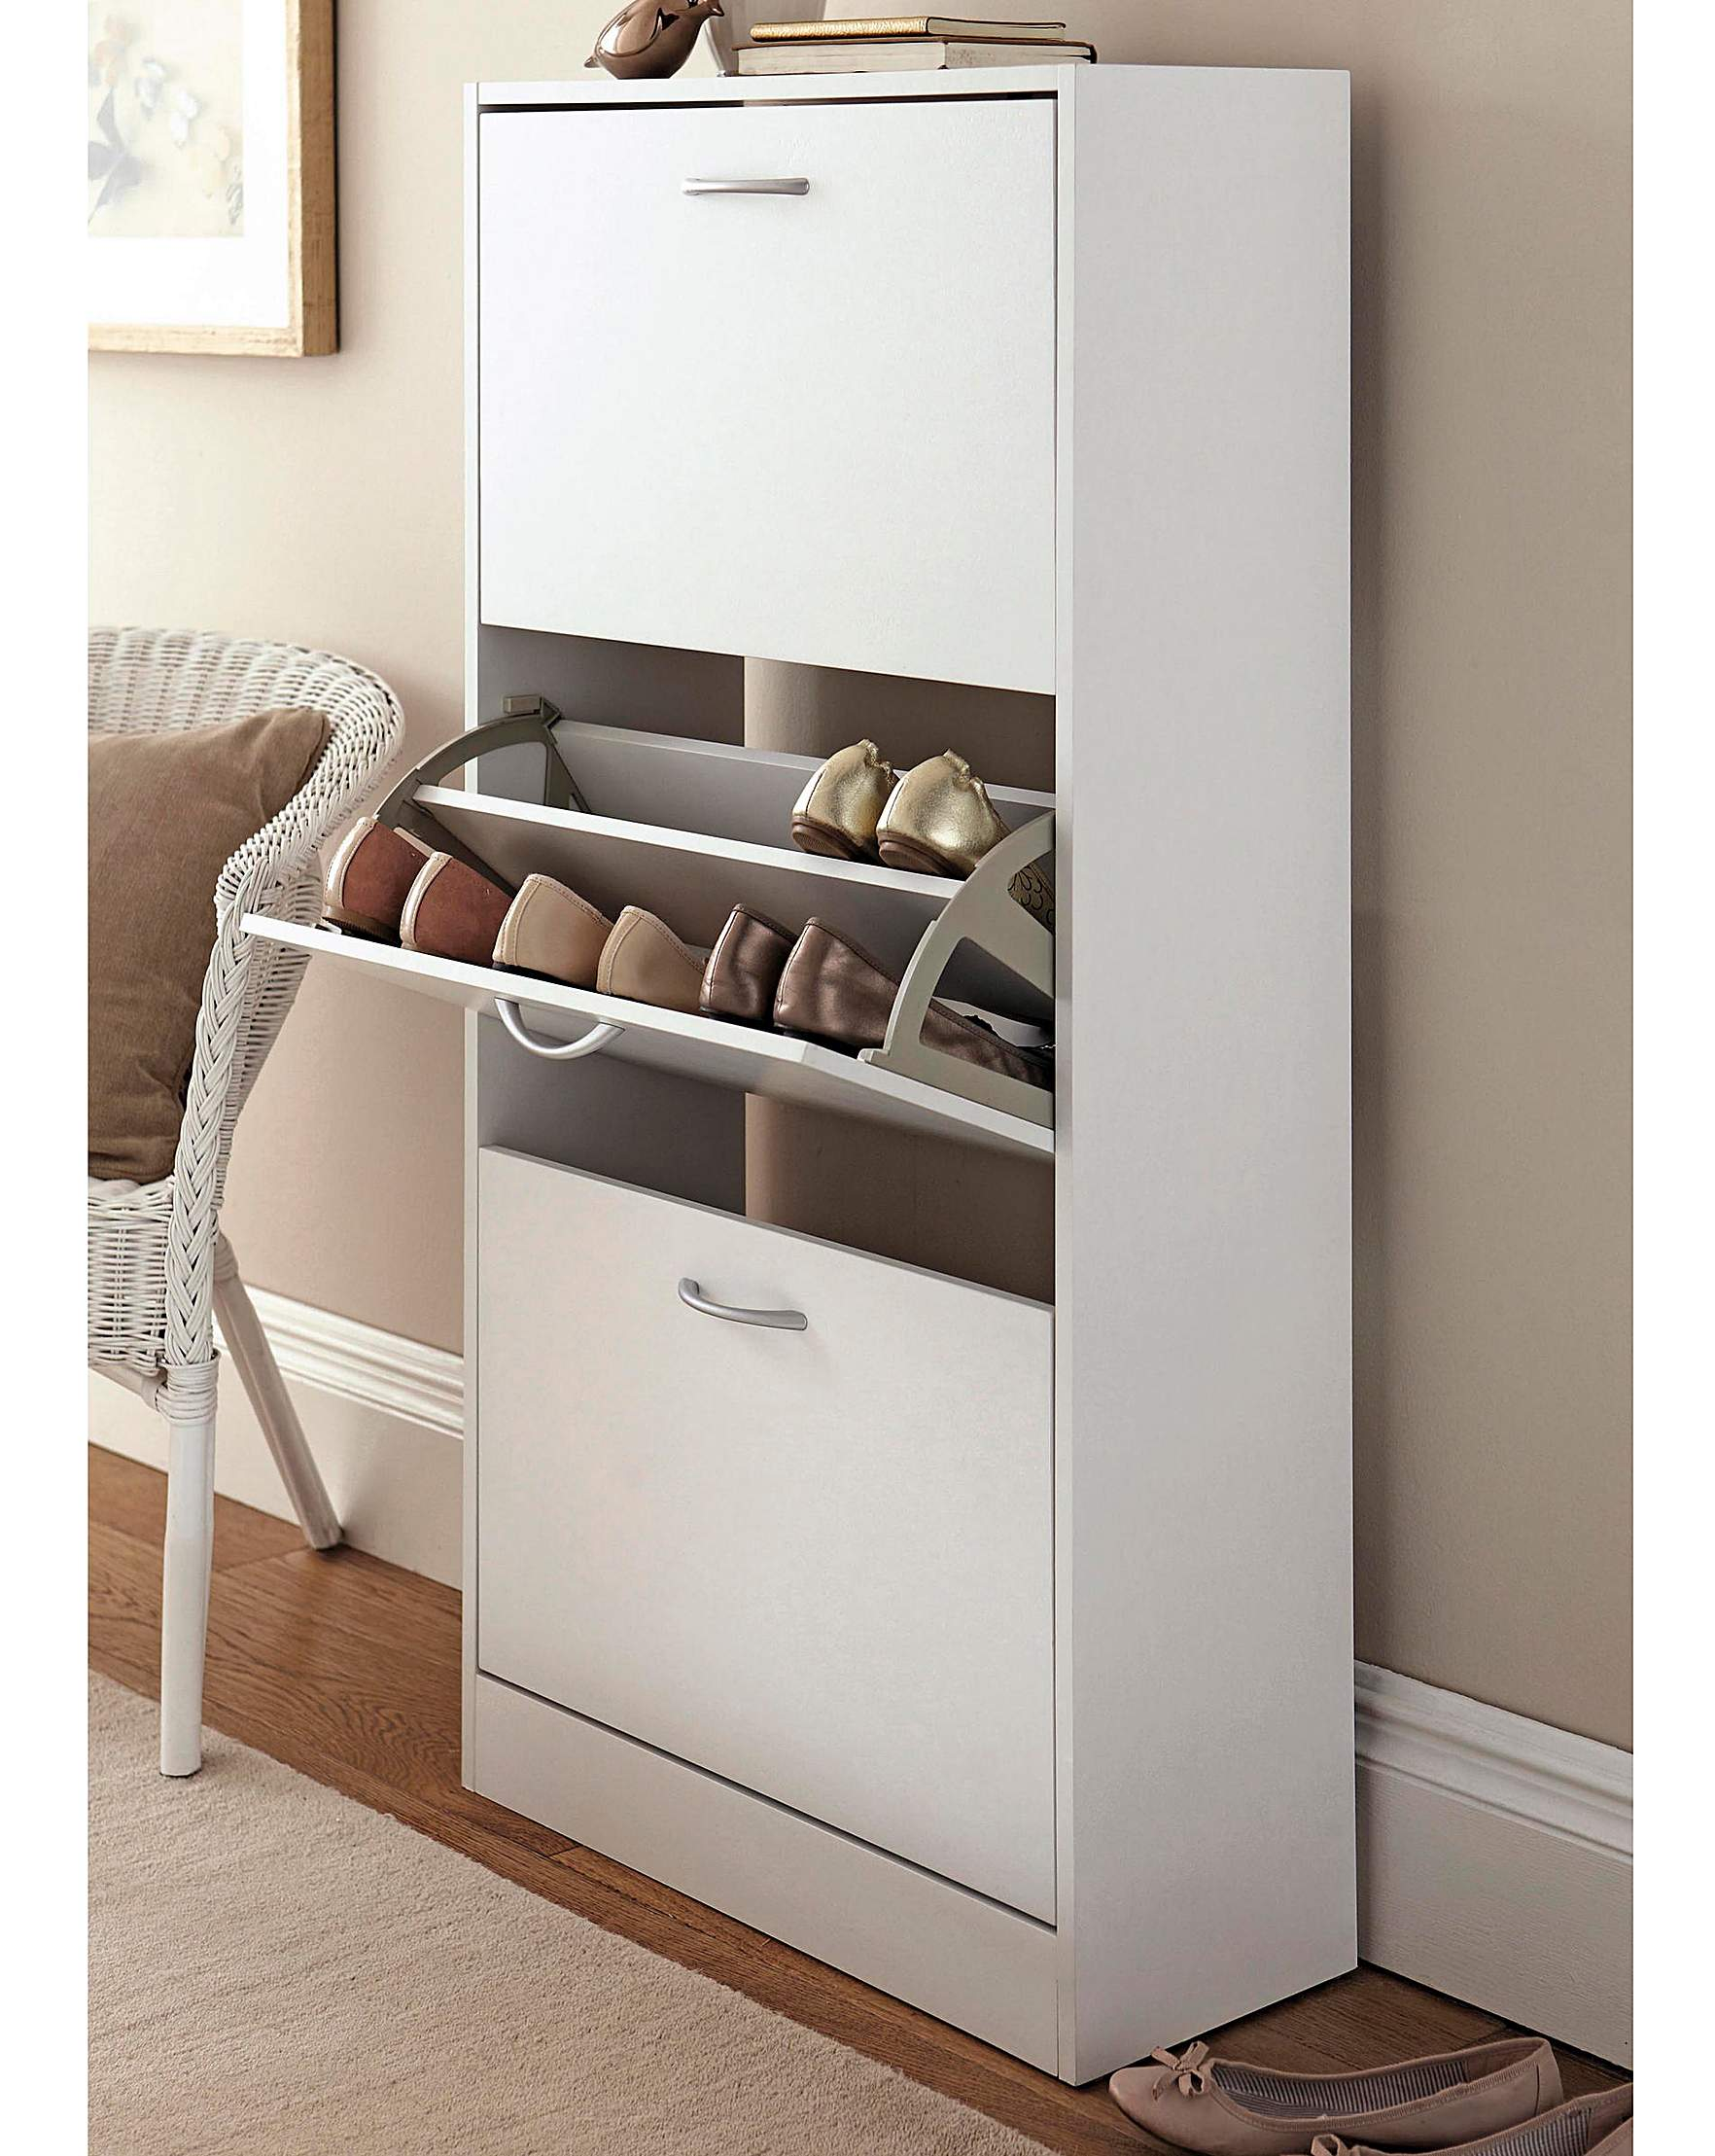 amazon espresso design baxton shoe size shoestorage full fantastic cabinet cupboard rack pictures of com studio storage harding